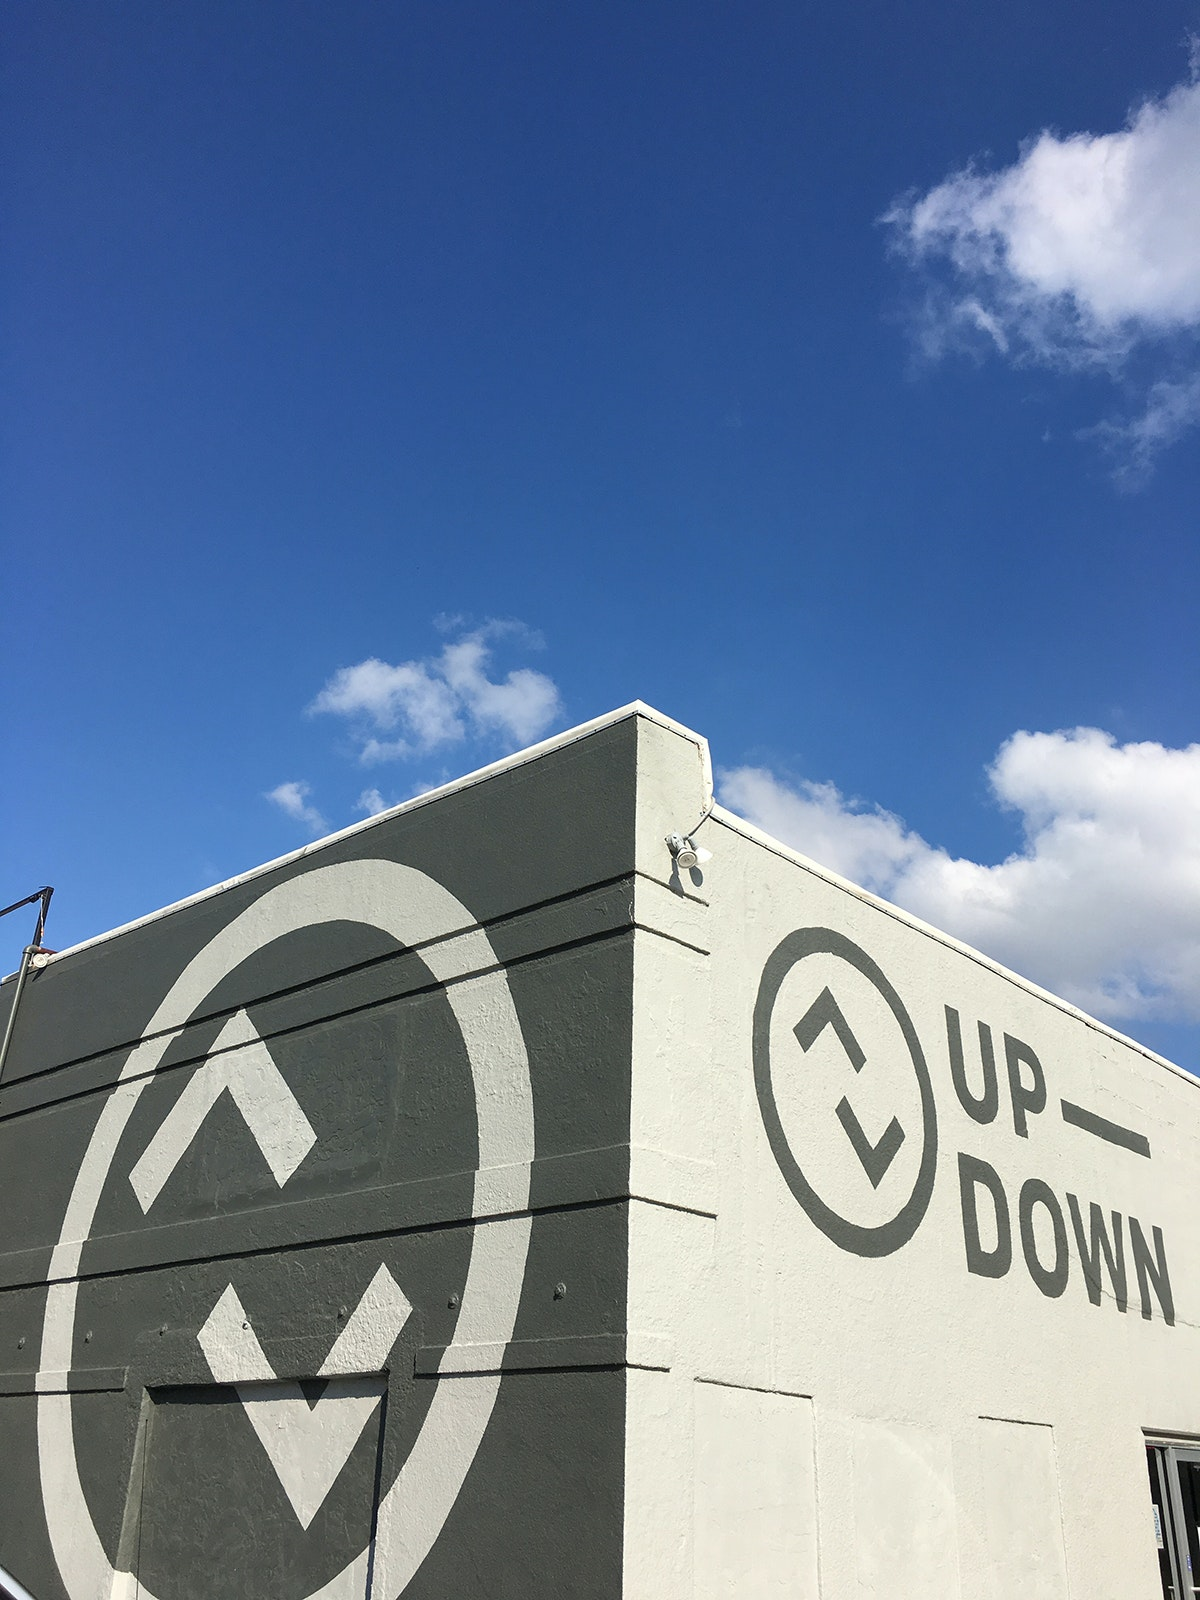 Up / Down Arcade Bar